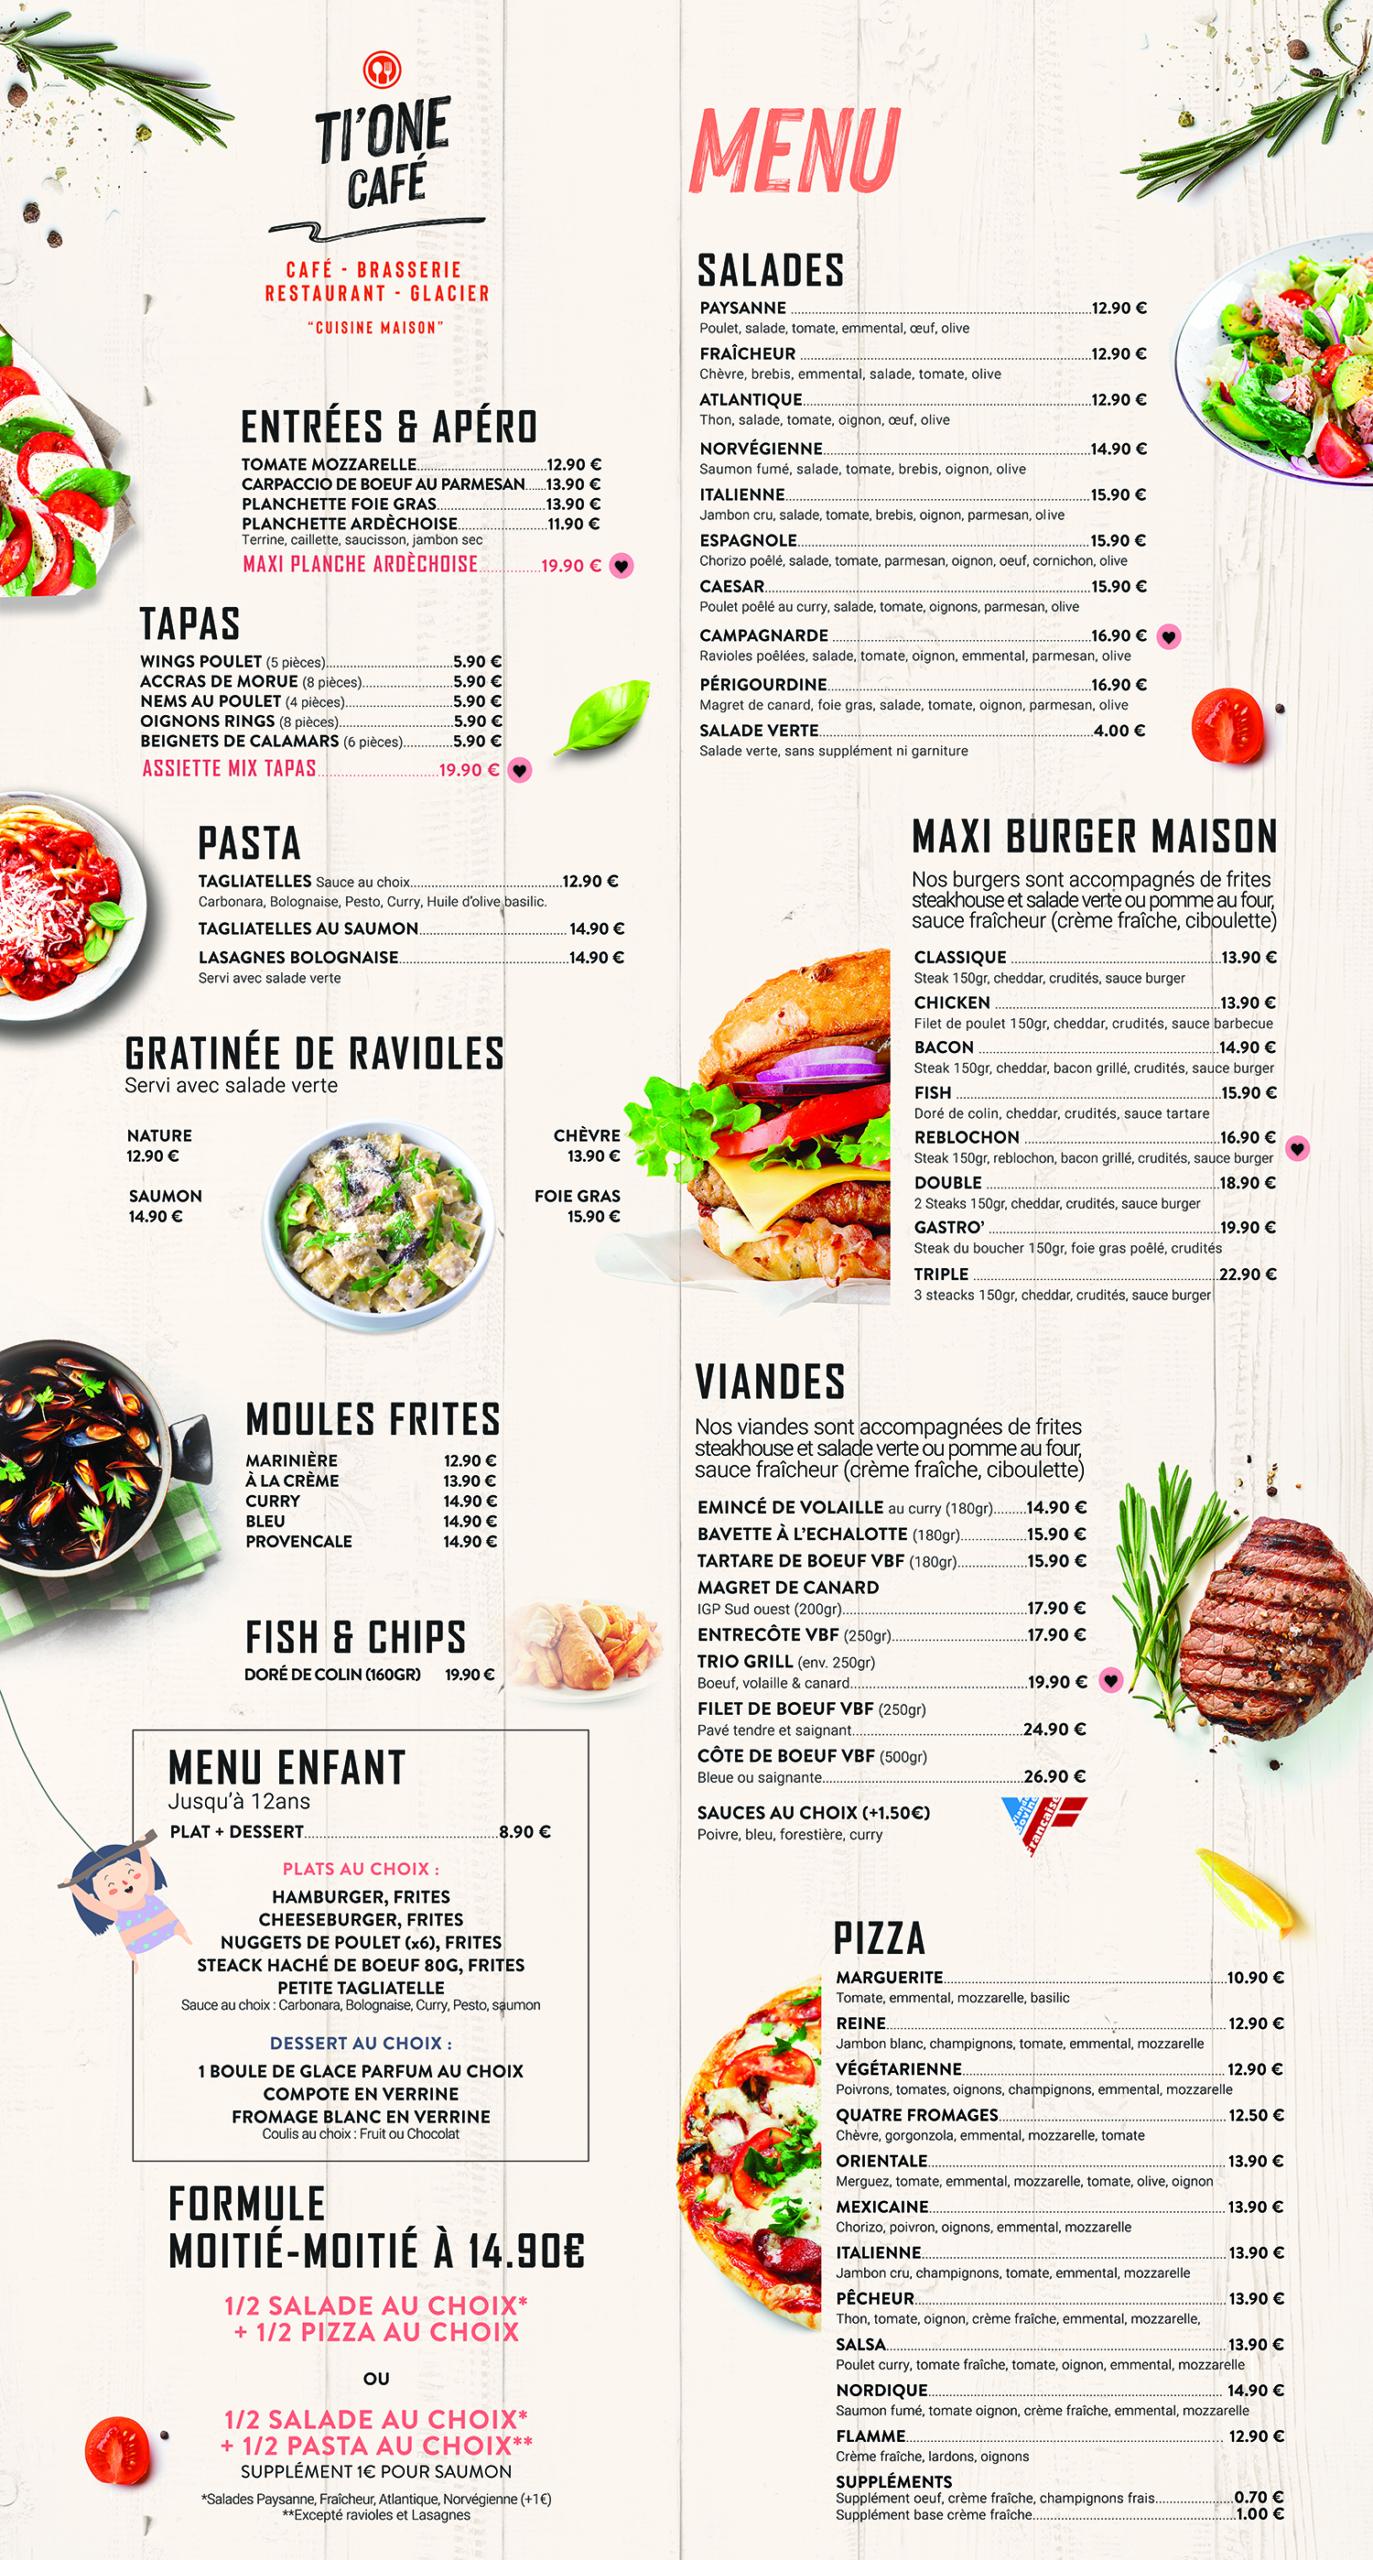 Création carte et menu restaurant ti one cafe